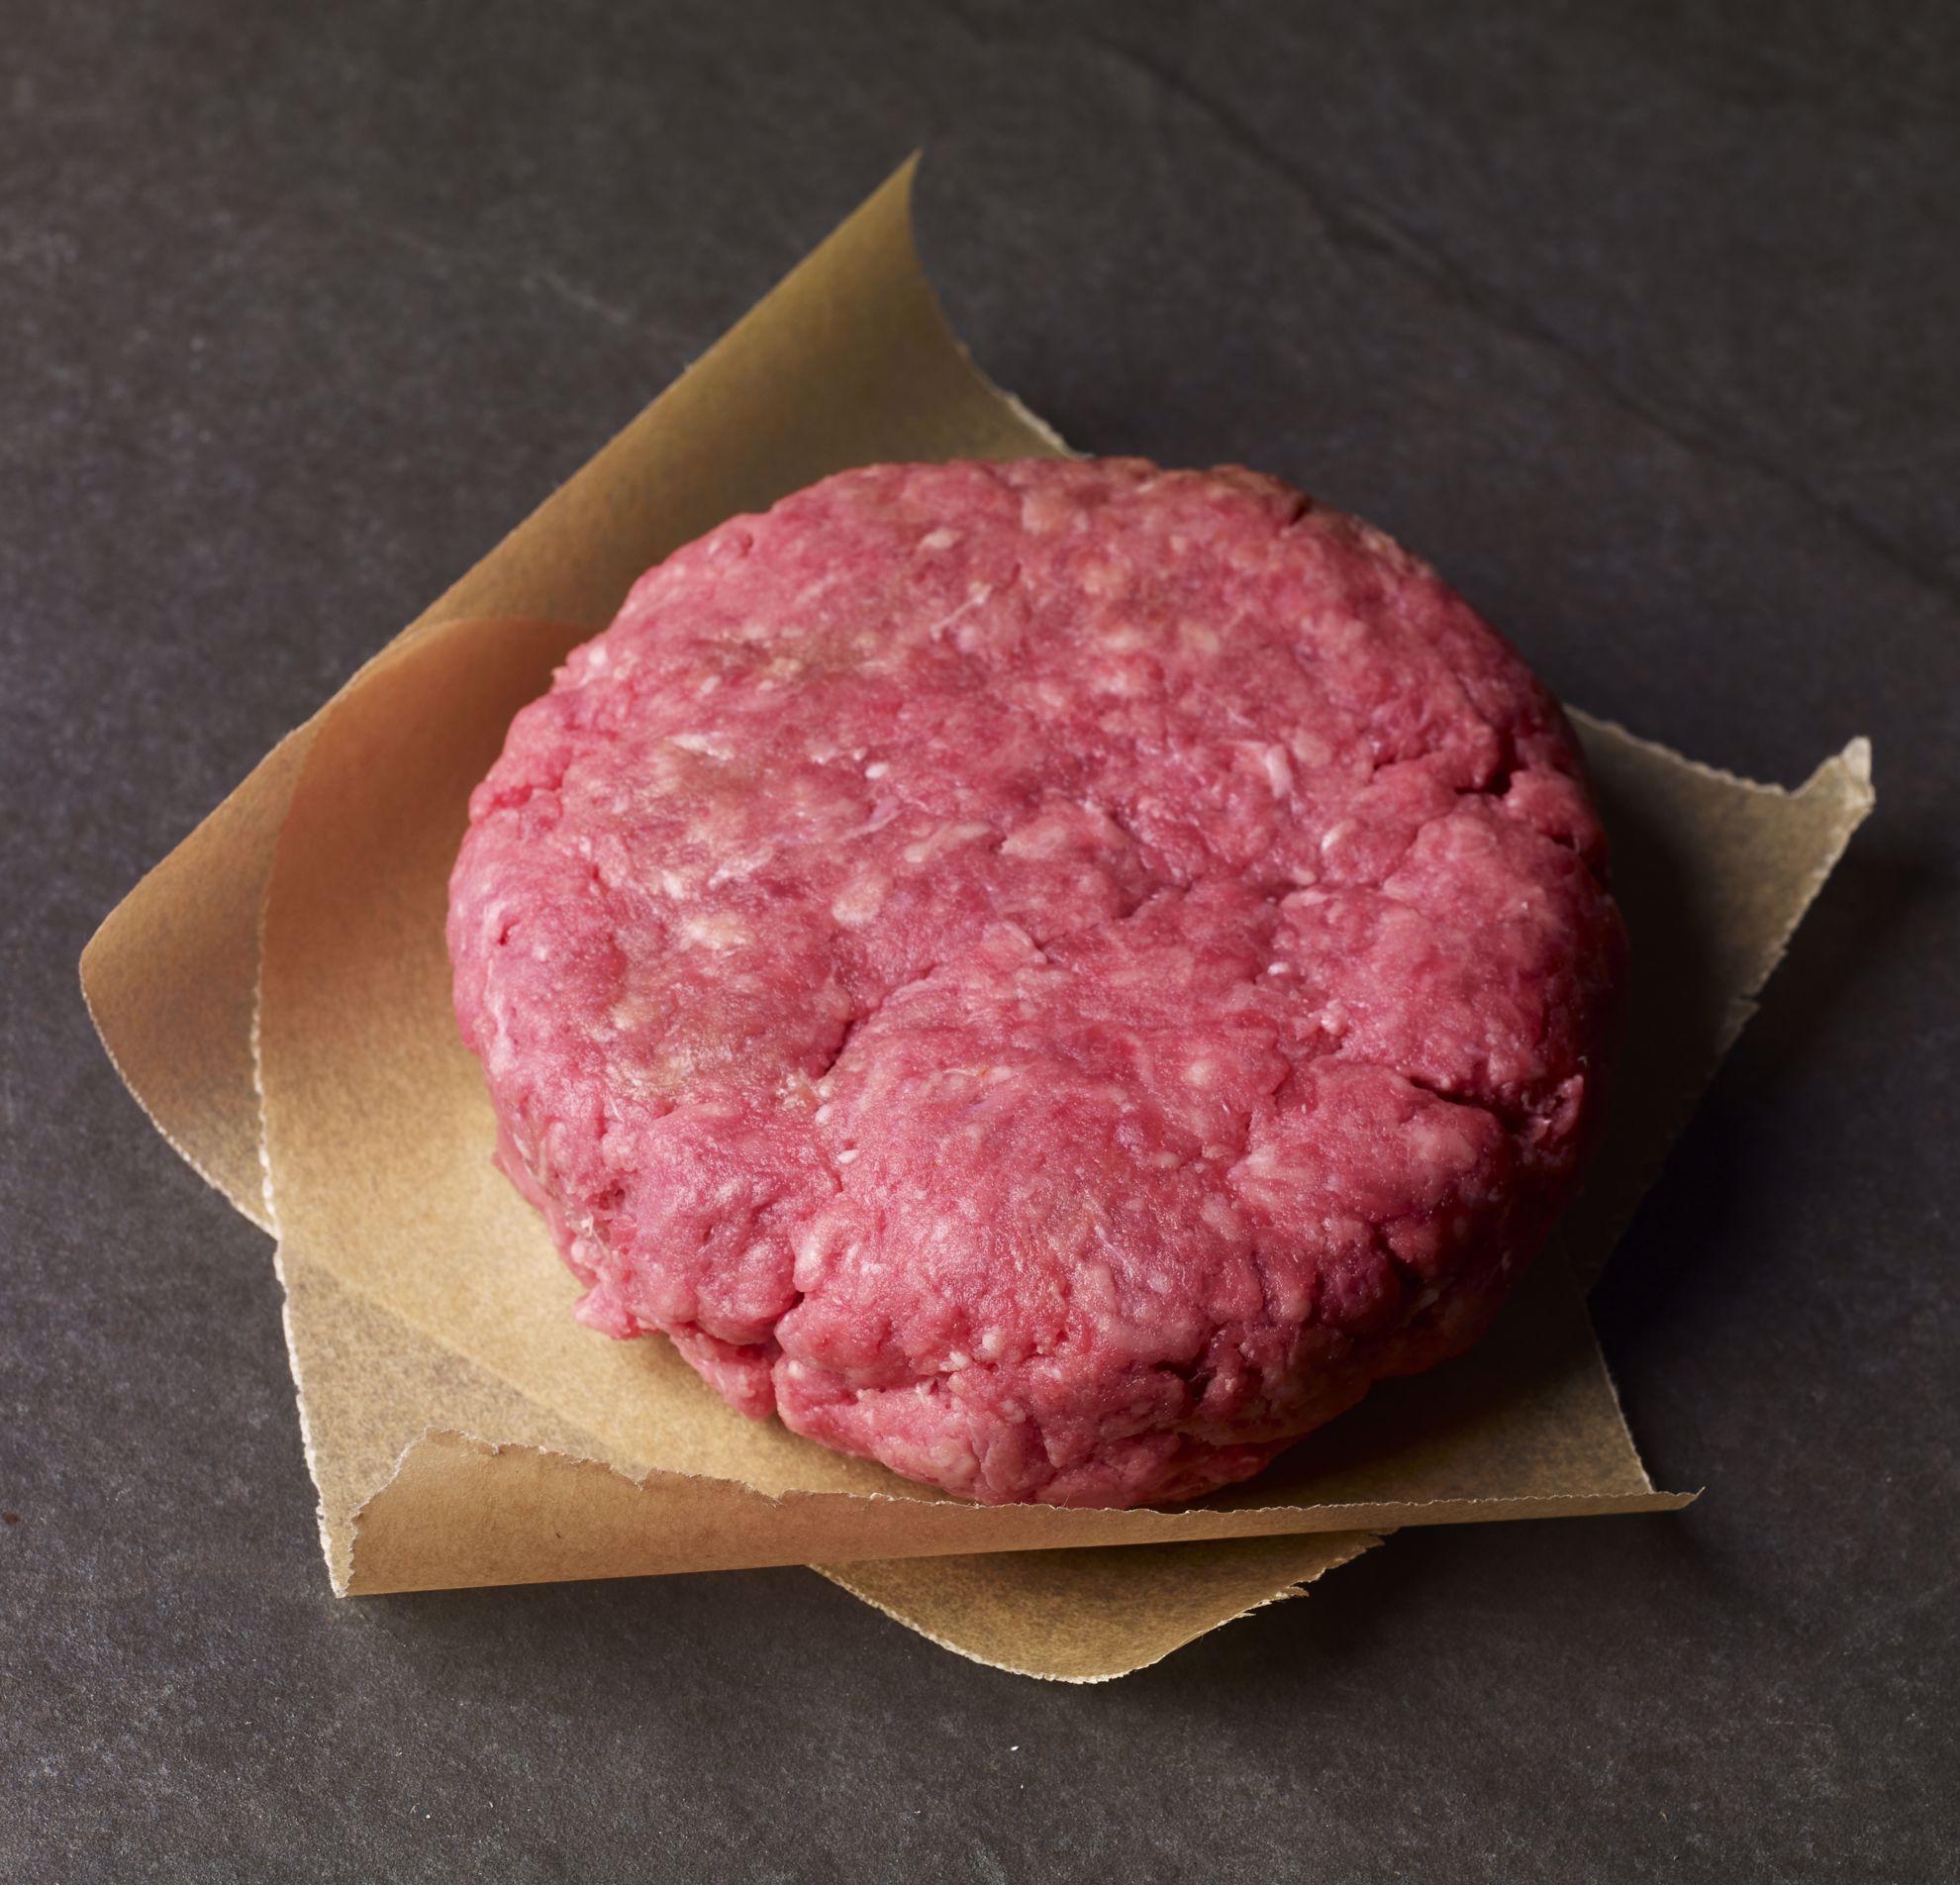 USDA Prime Filet Mignon Burger